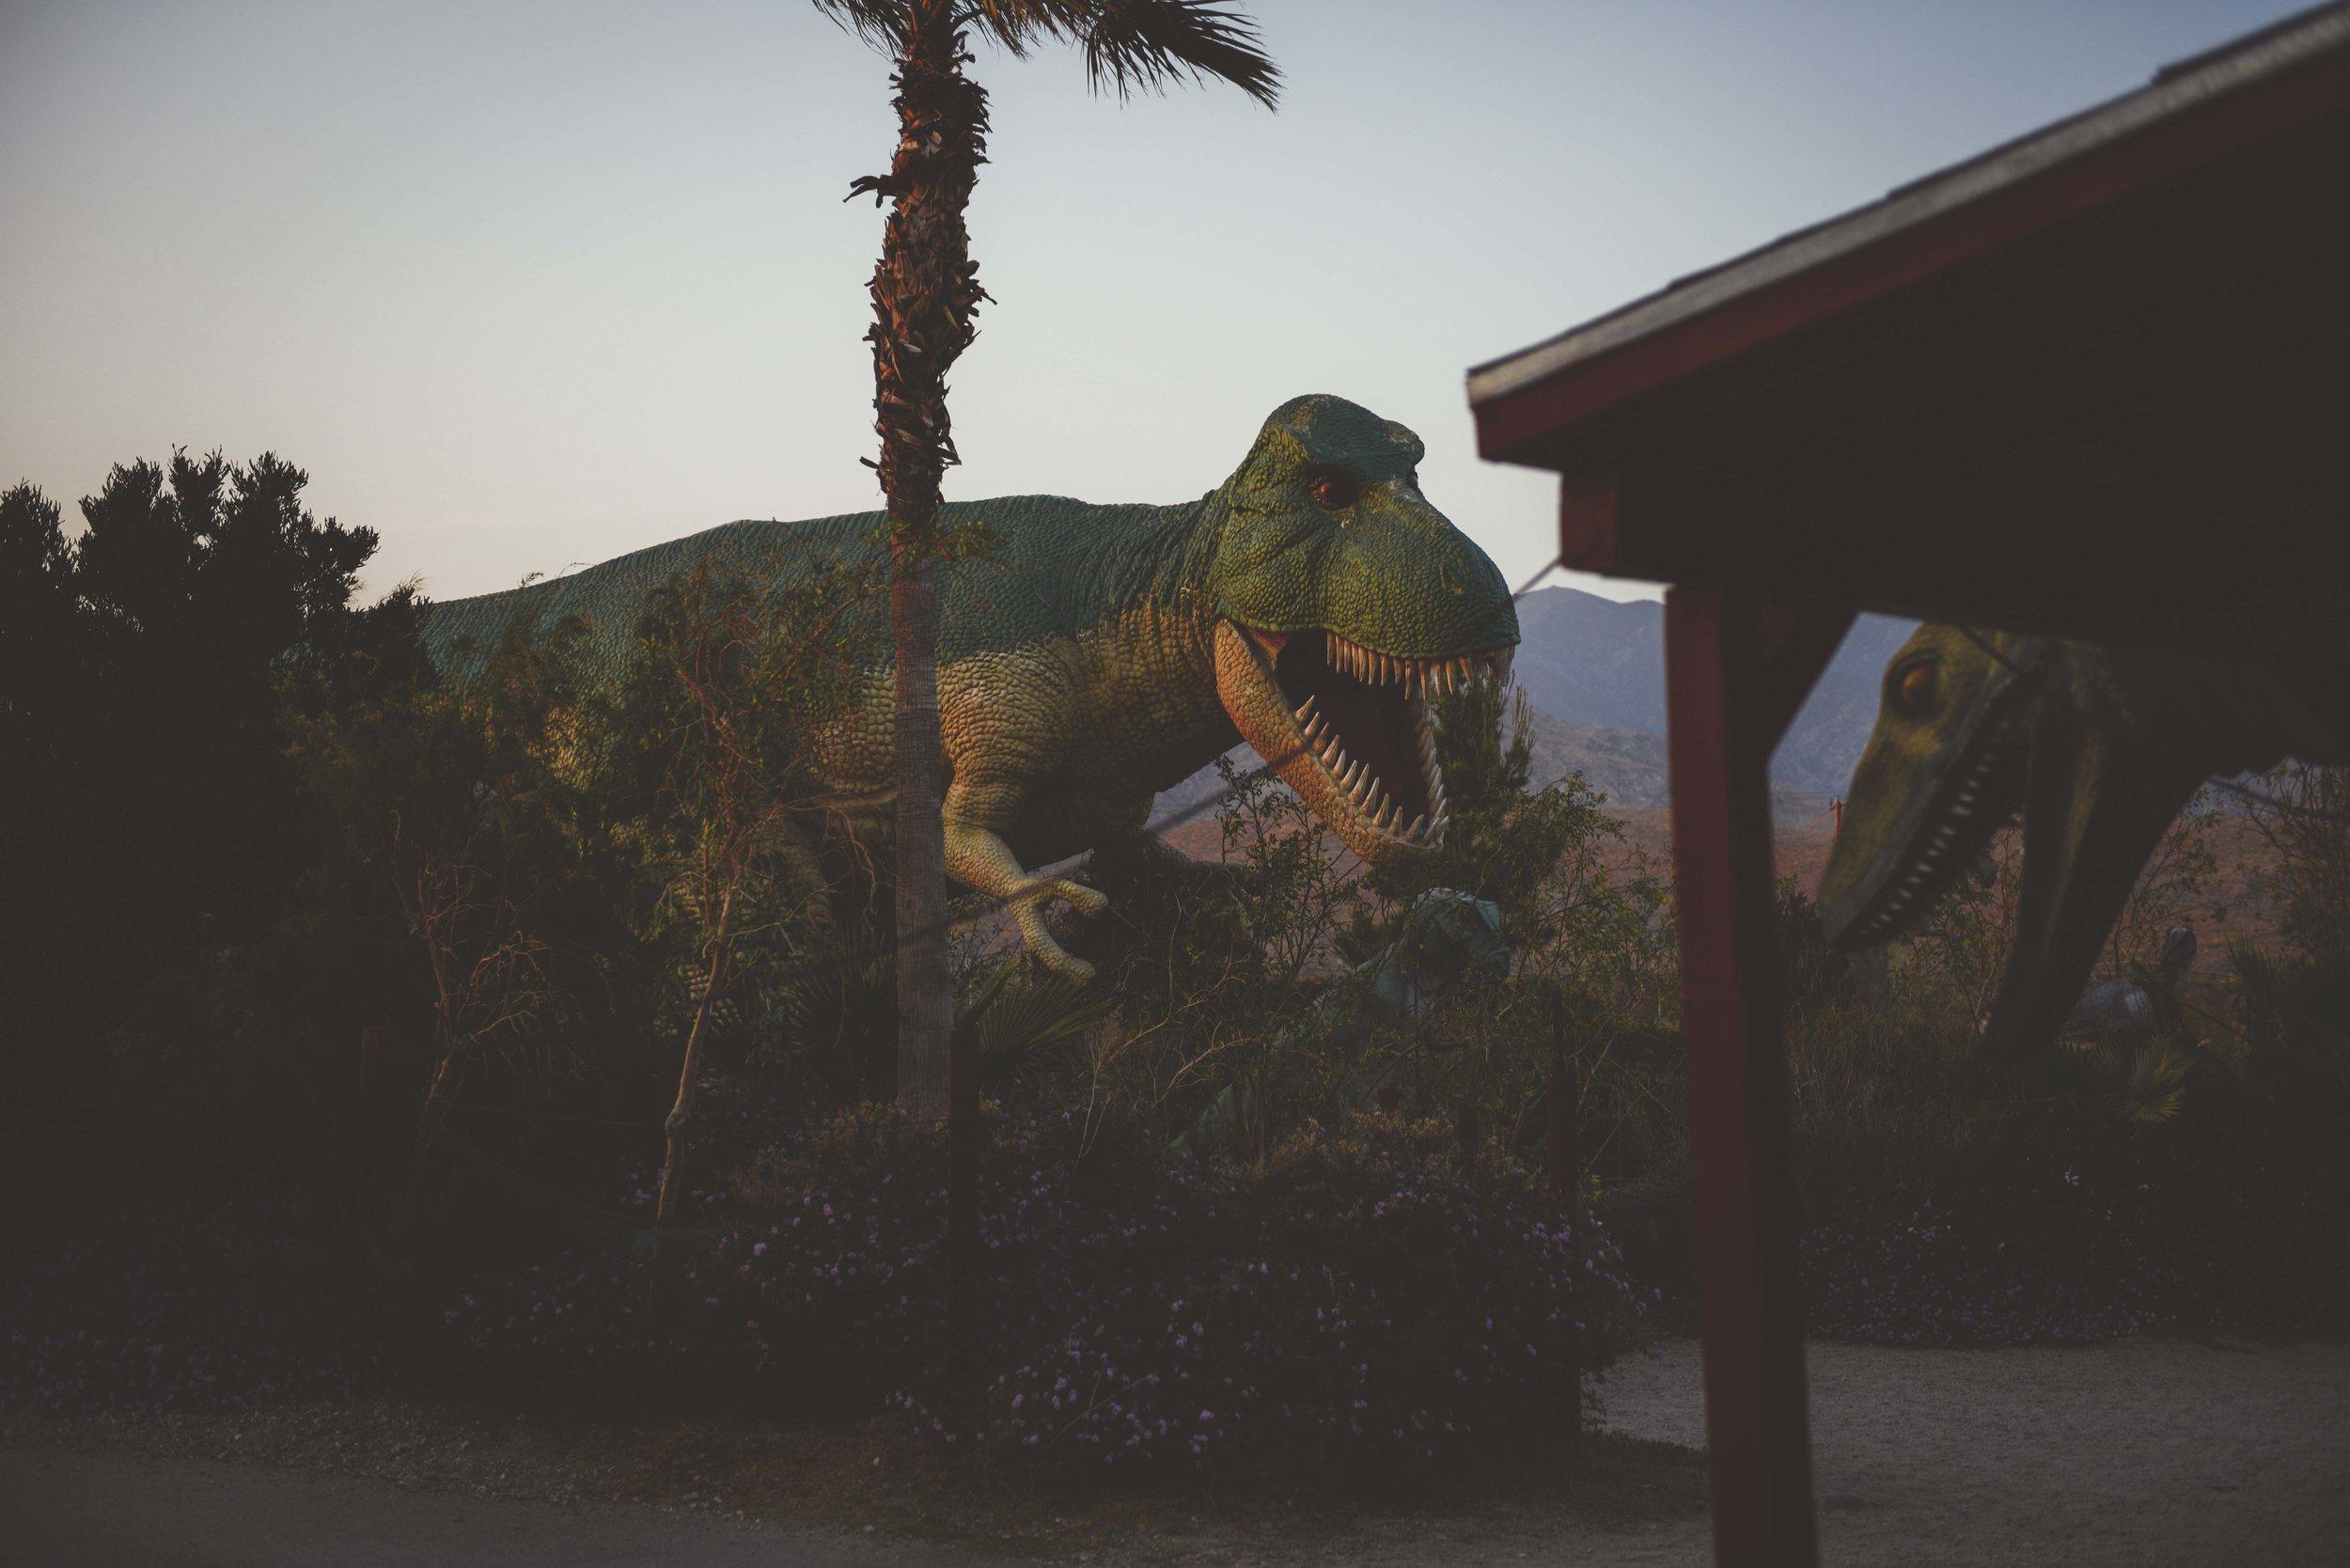 Palm Spings Dino.jpg